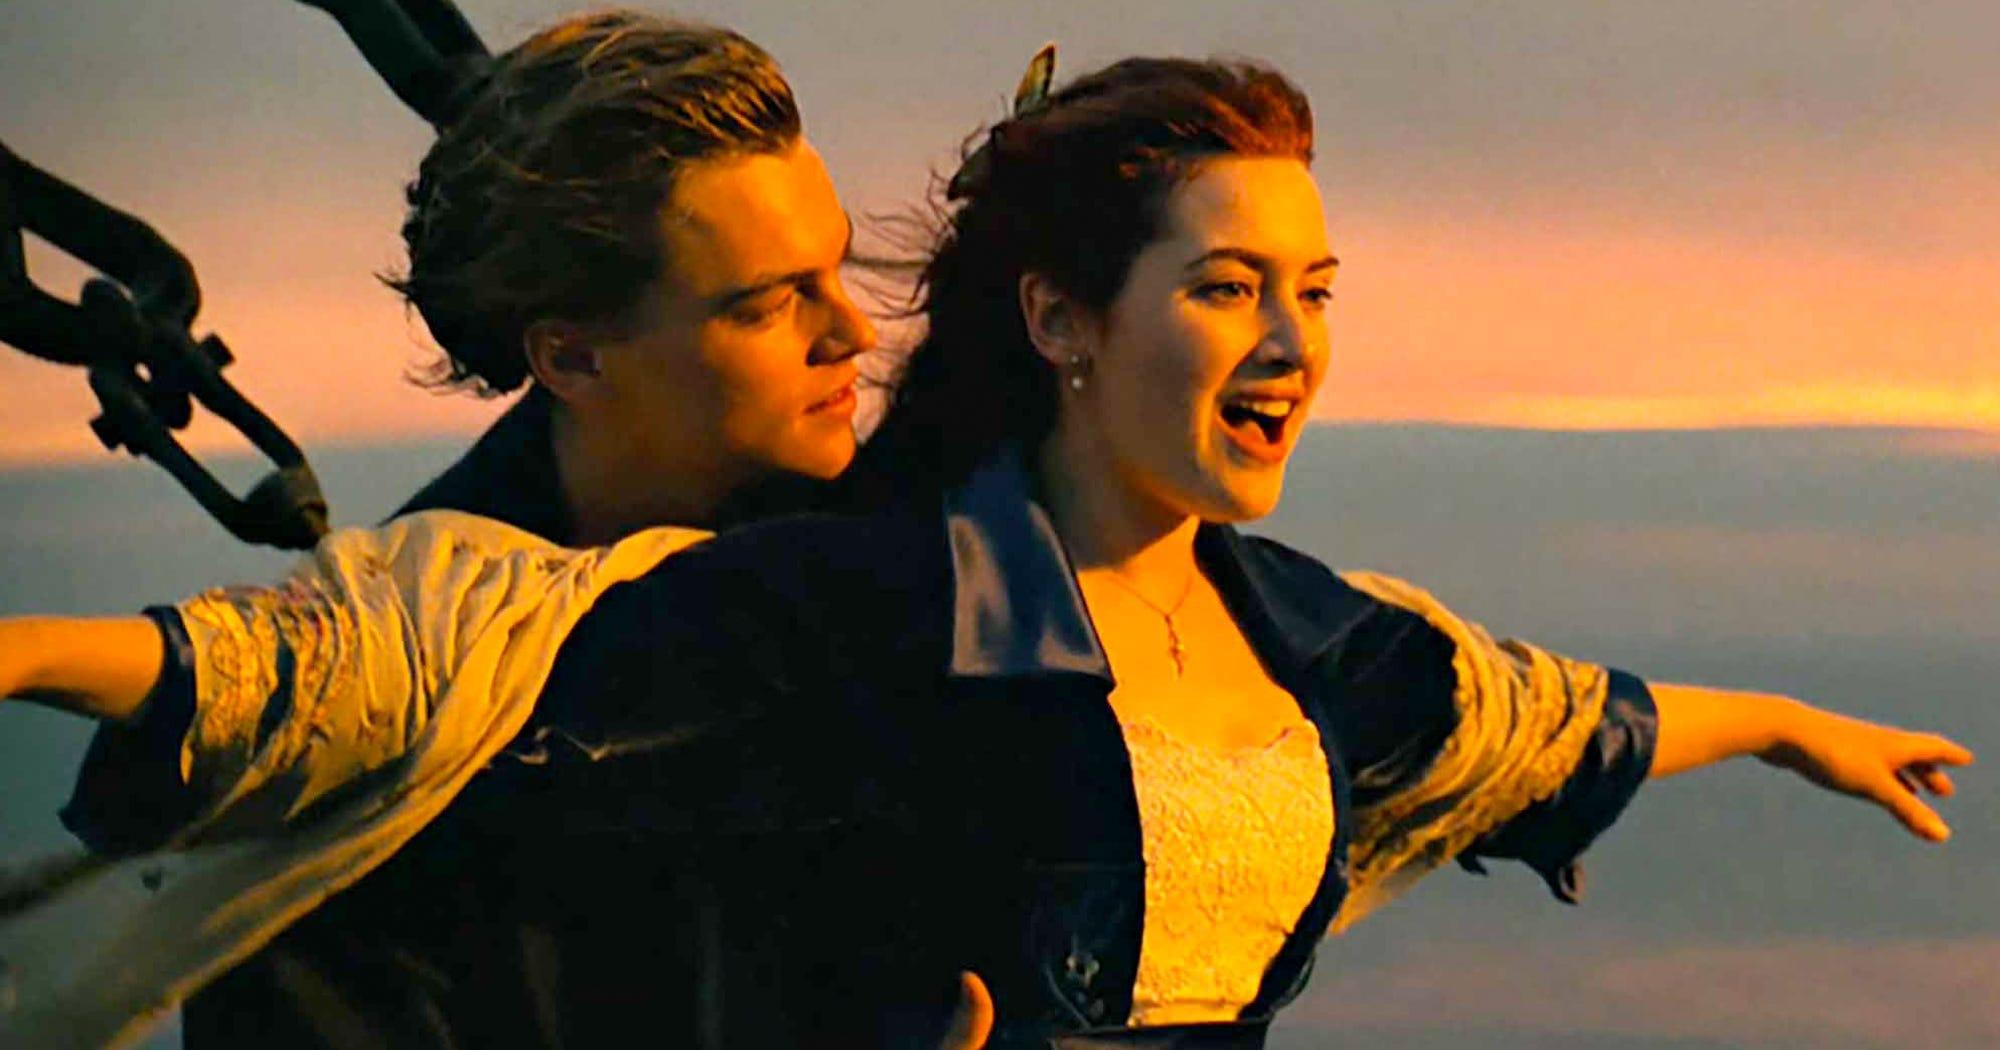 Billy Zane Thinks Titanic's Rose Chose The Wrong Beau